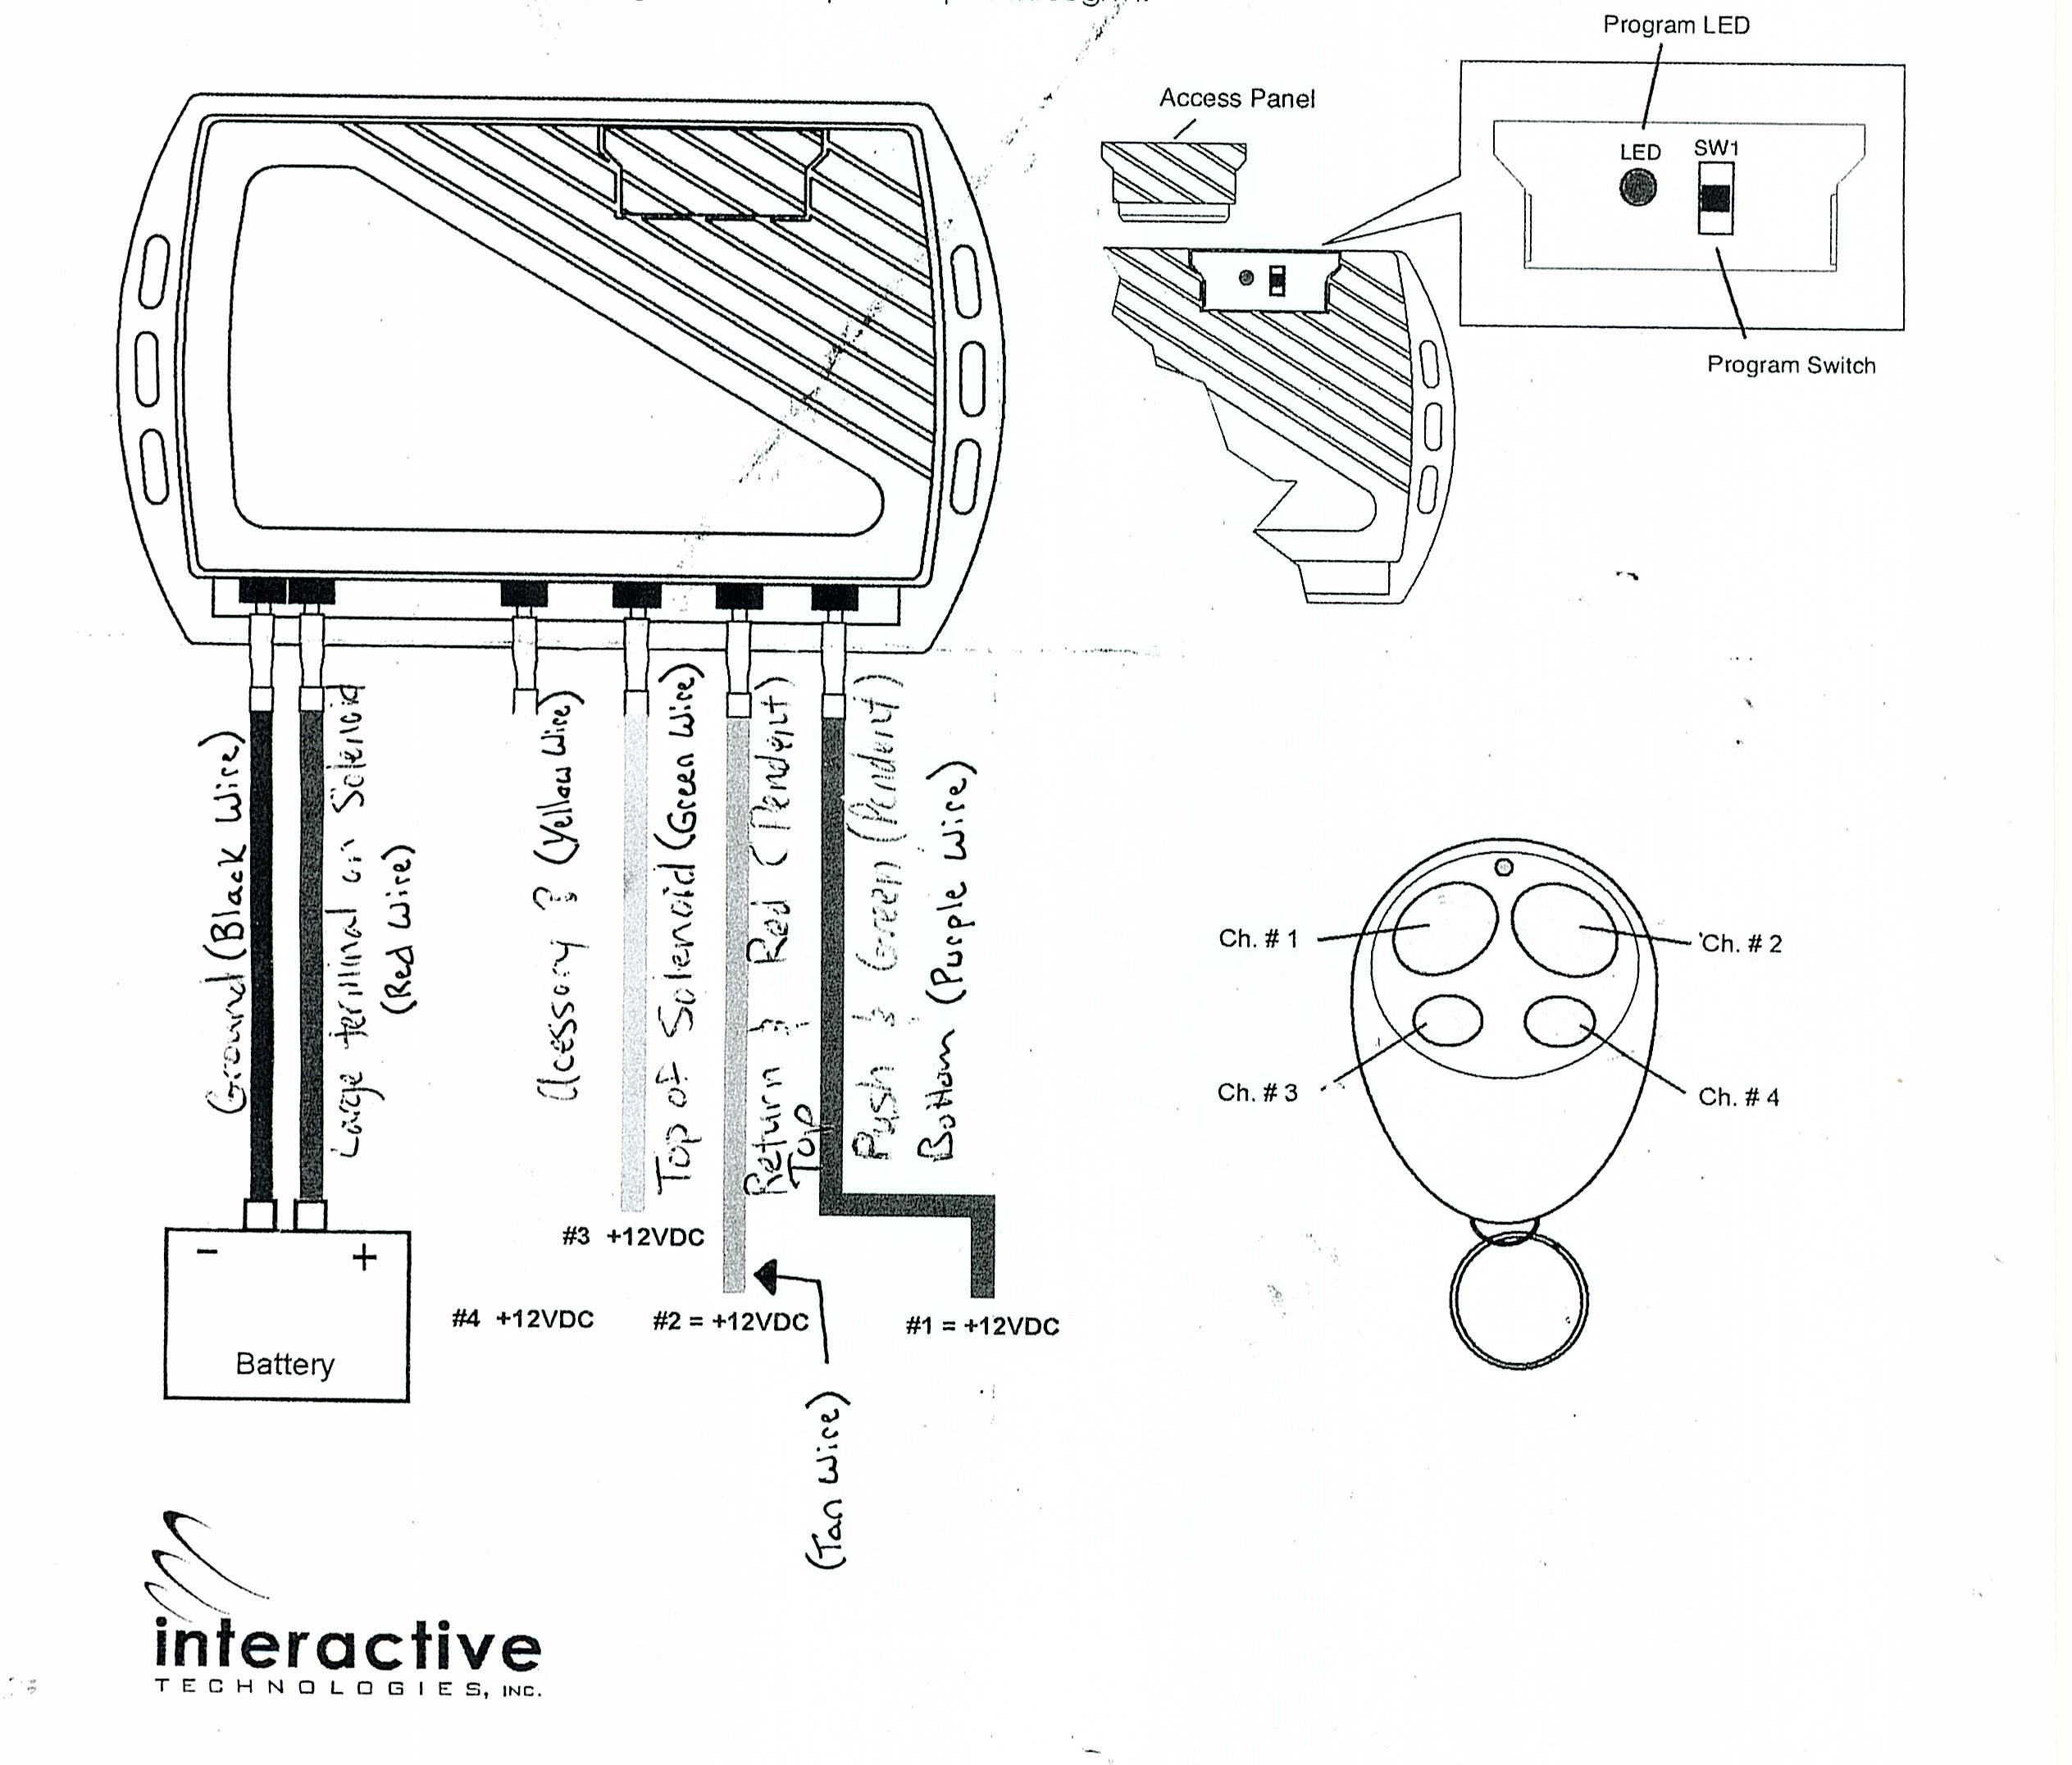 Vipper 4 Wire Diagram Diagram] Gem Remotes Wiring Diagram Full Version Hd Quality Of Vipper 4 Wire Diagram